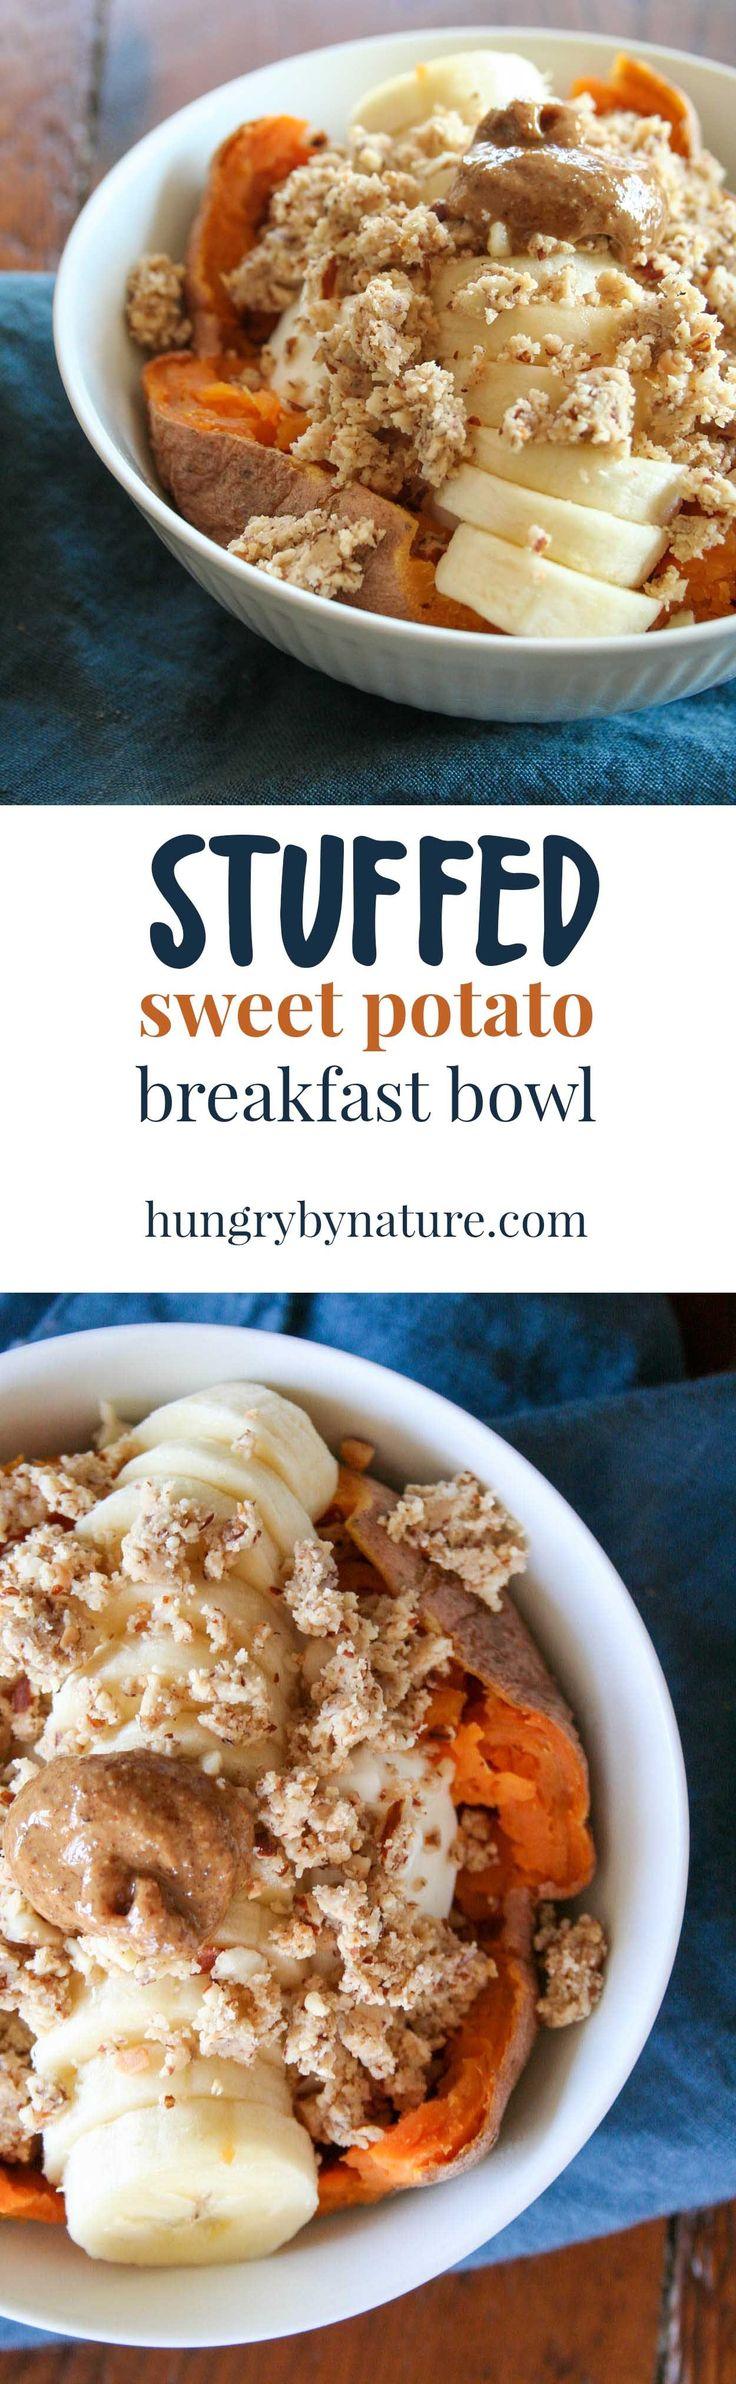 STUFFED sweet potato breakfast bowl | Siggi's, Wella Bar, easy, gluten free, recipe, simple, healthy, almond butter | hungrybynature.com